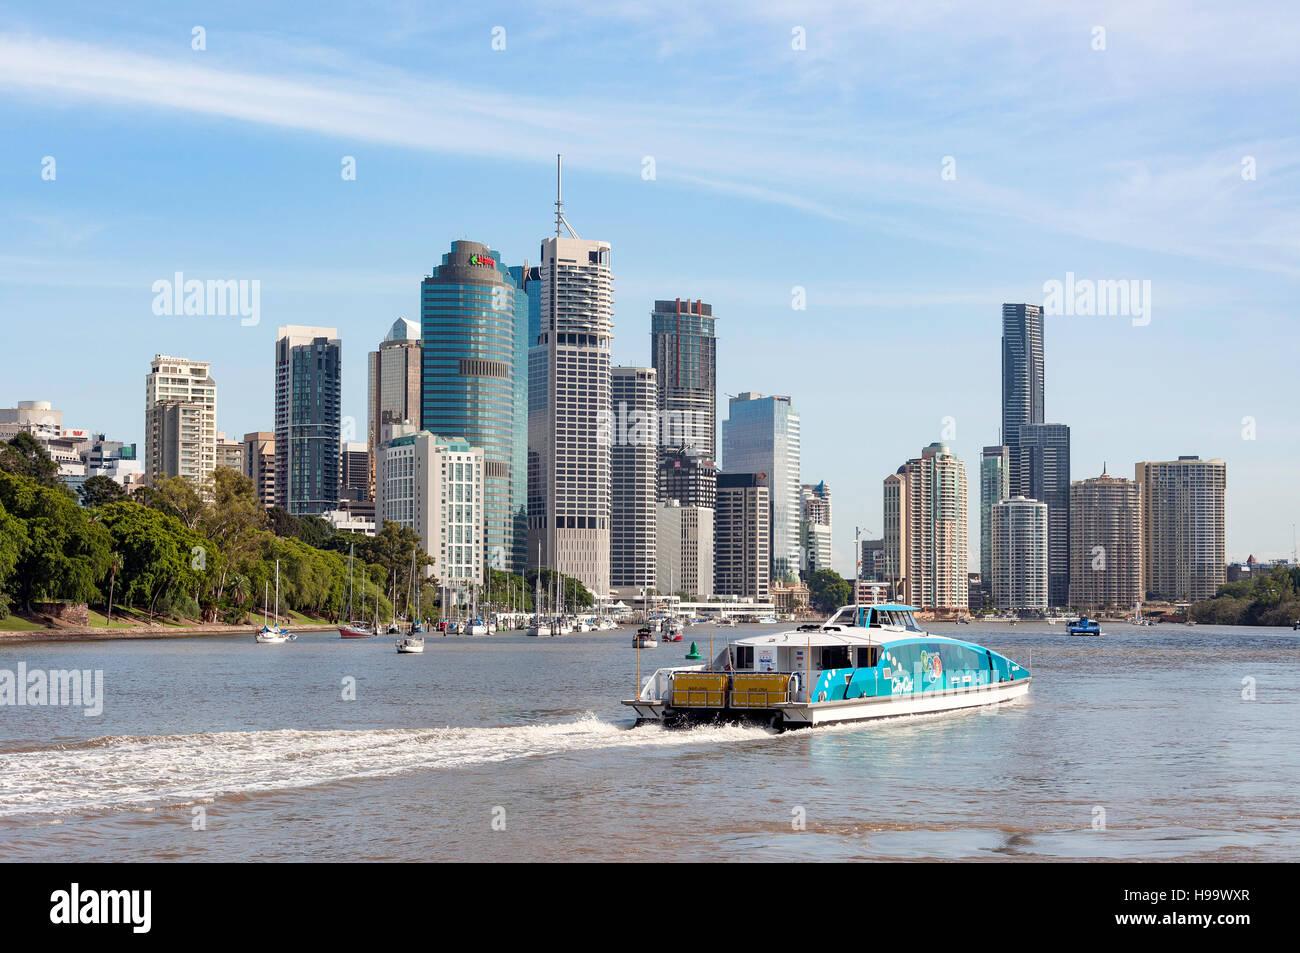 City view across Brisbane River from Kangaroo Point, Brisbane City, Brisbane, Queensland, Australia - Stock Image